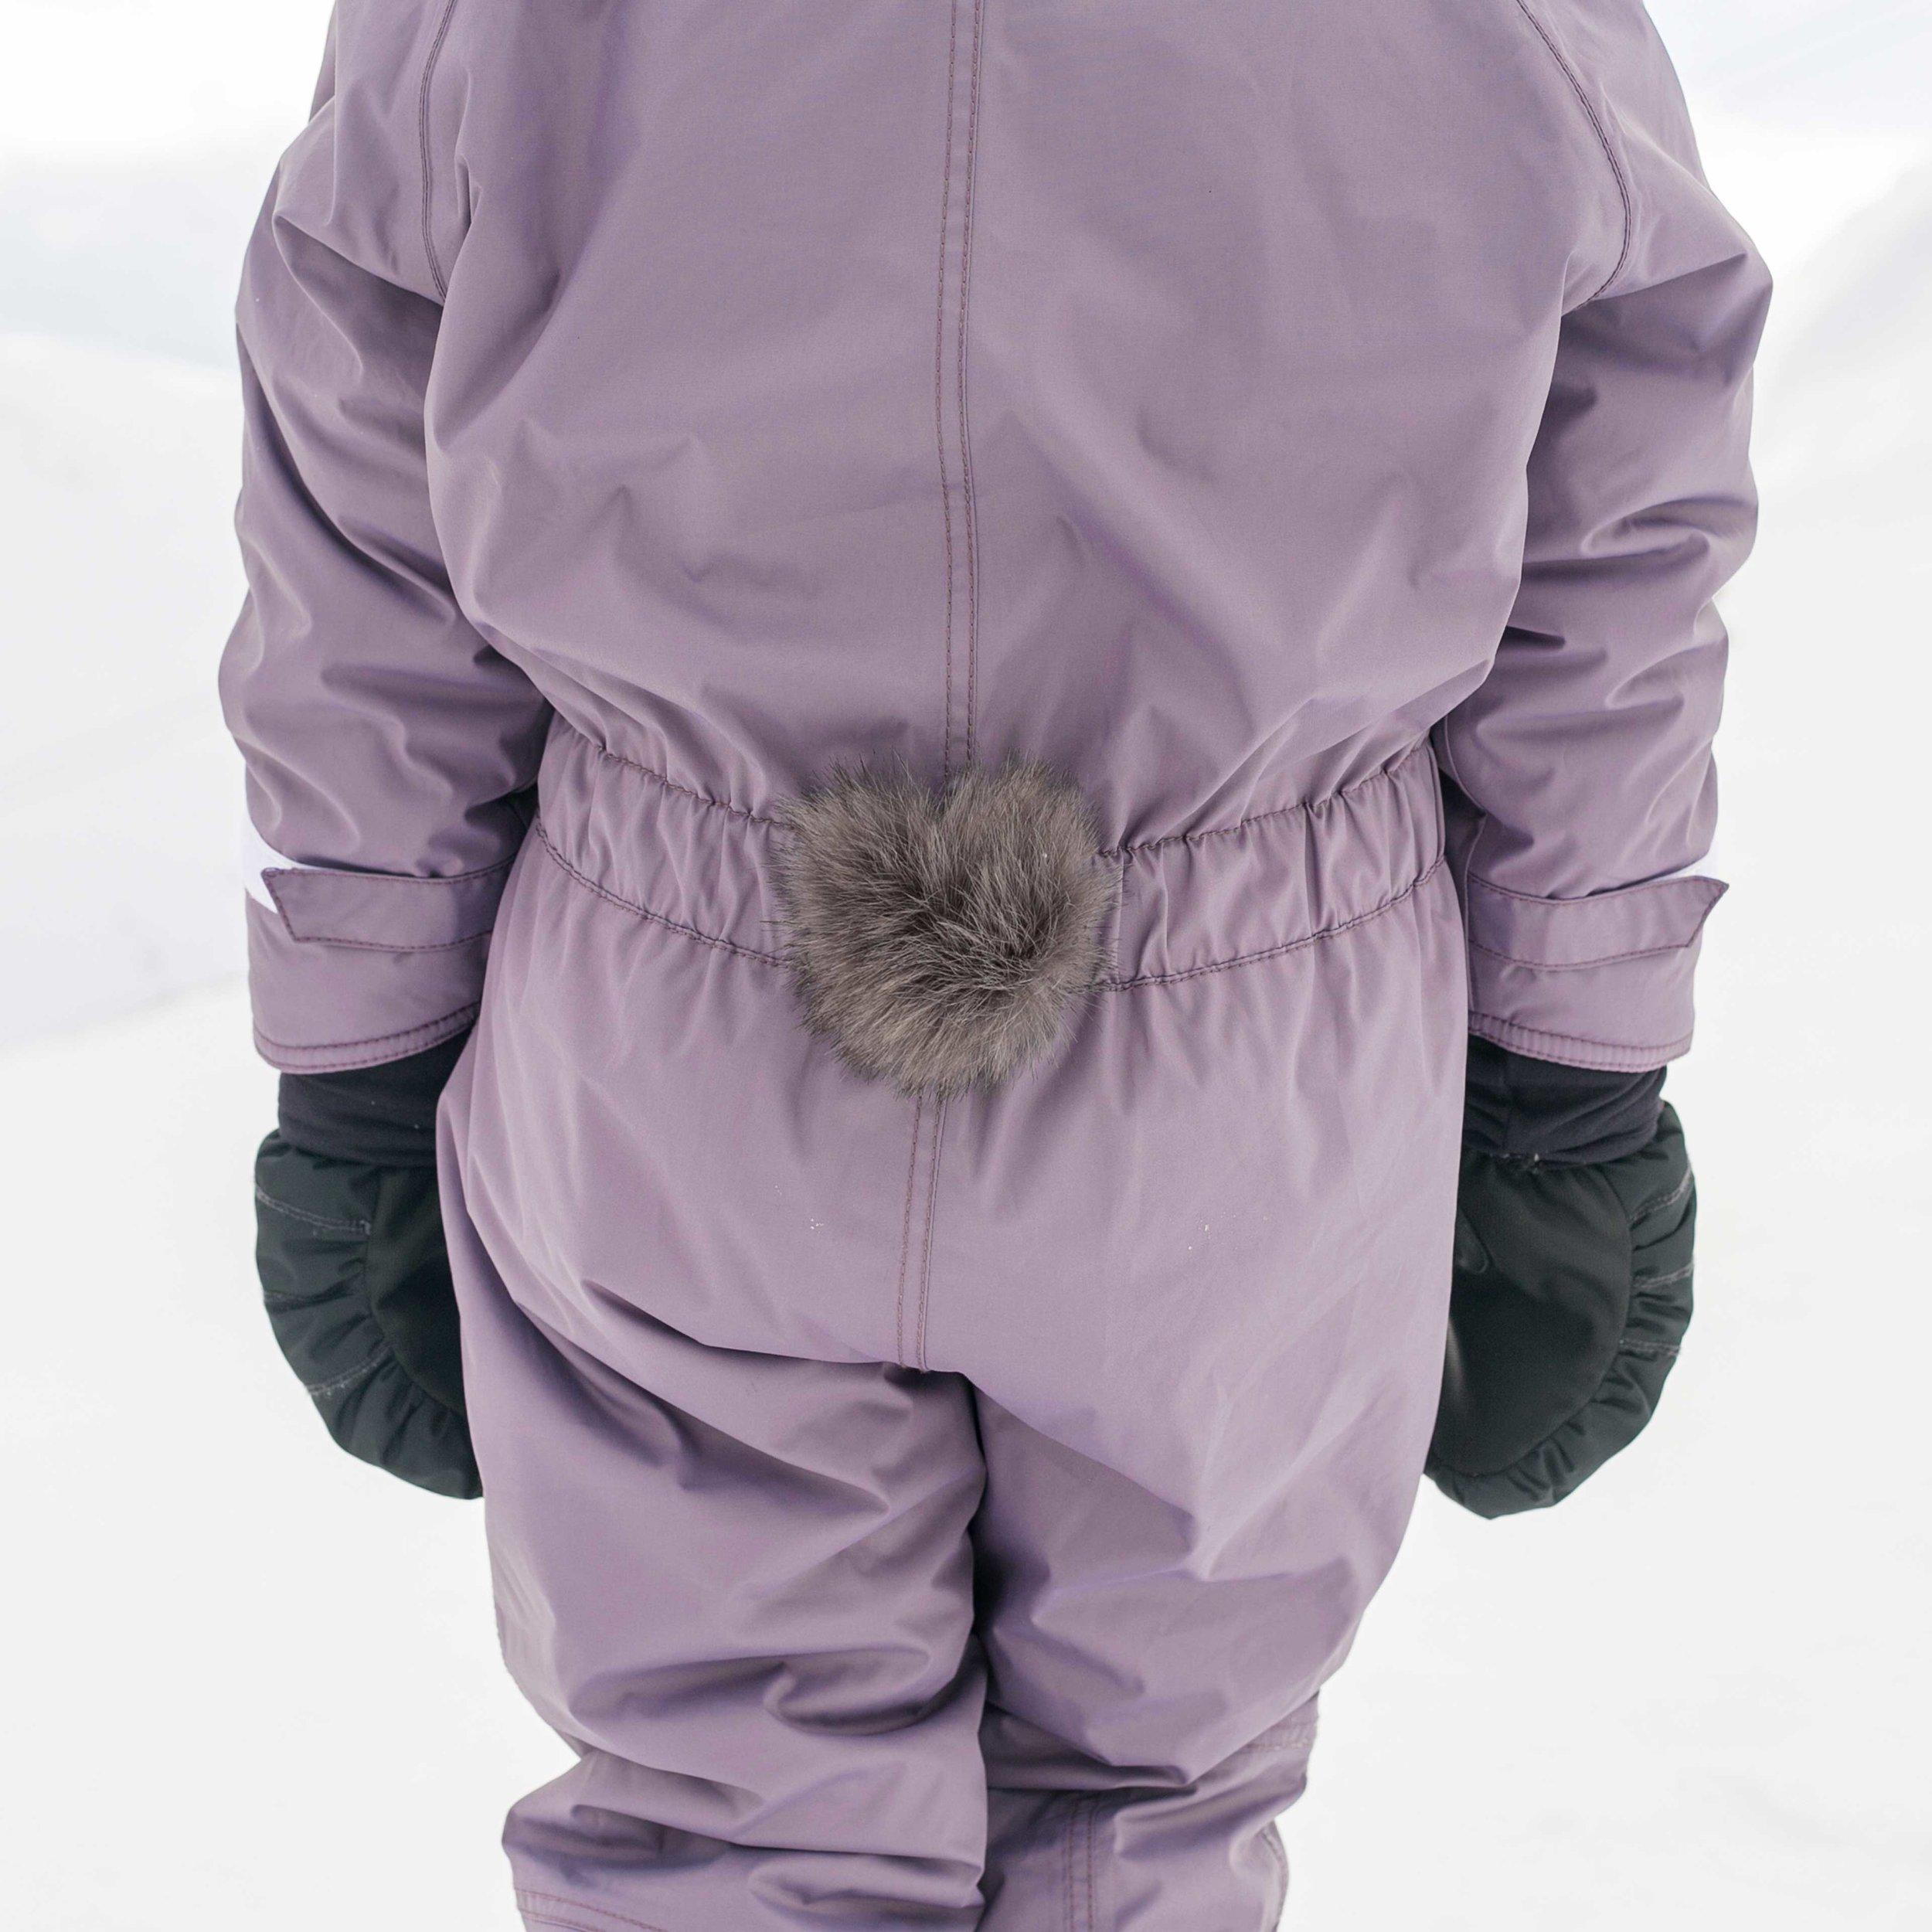 Kids Ski Suit Design